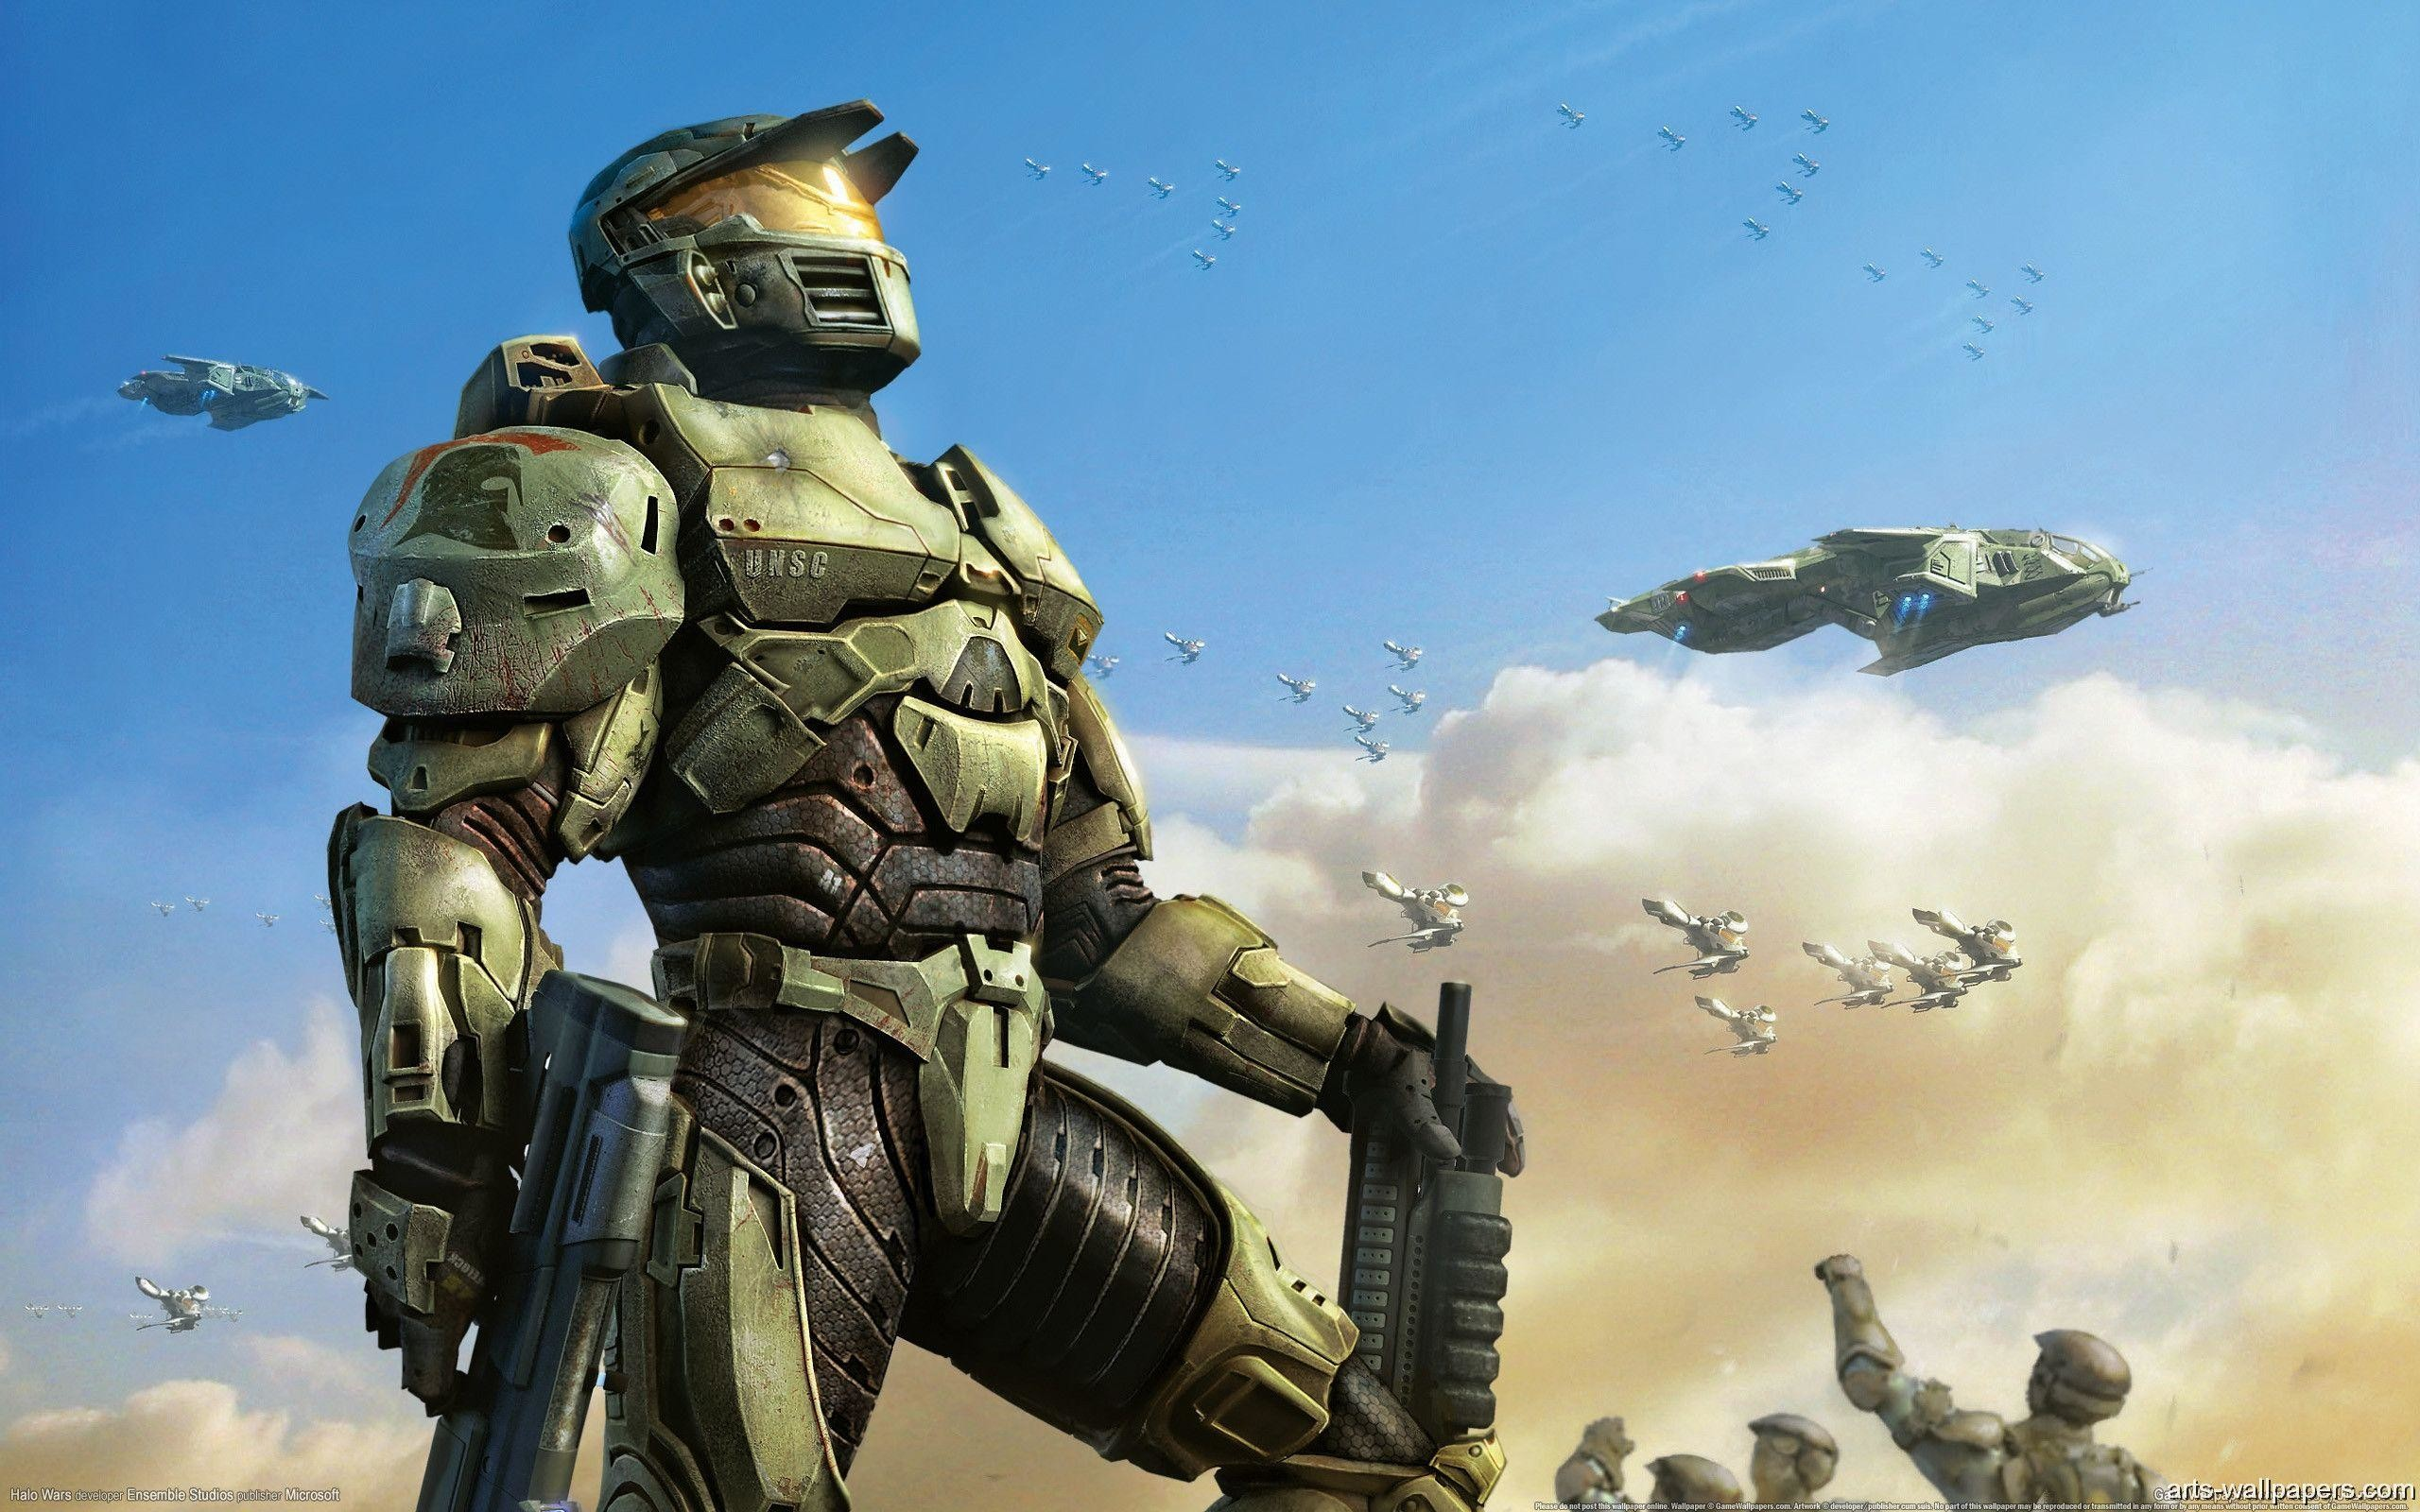 Wallpapers Halo Wars Video Game Desktop Backgrounds Es Walls .